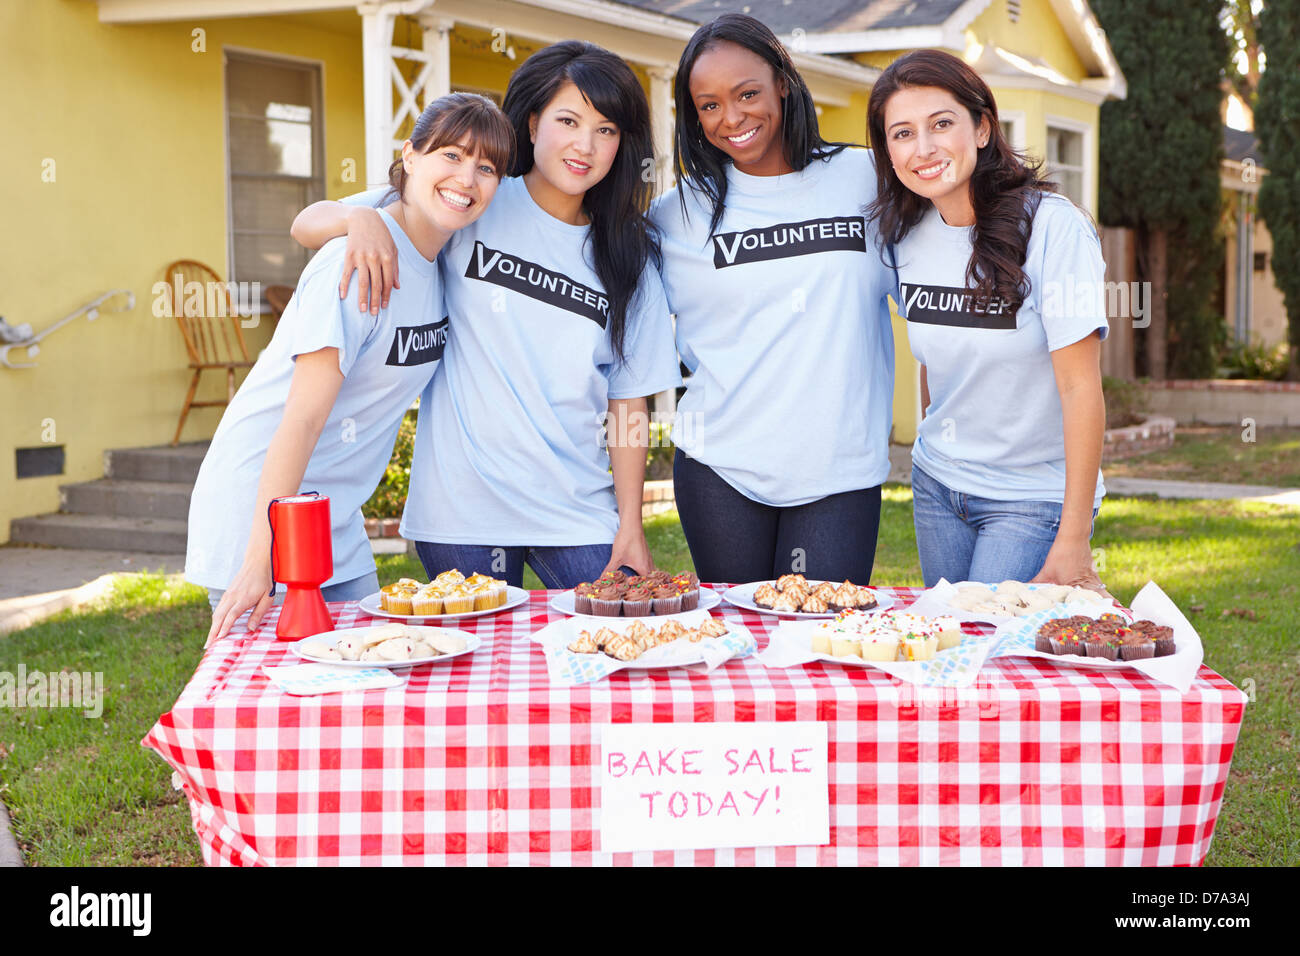 Team Of Women Running Charity Bake Sale - Stock Image